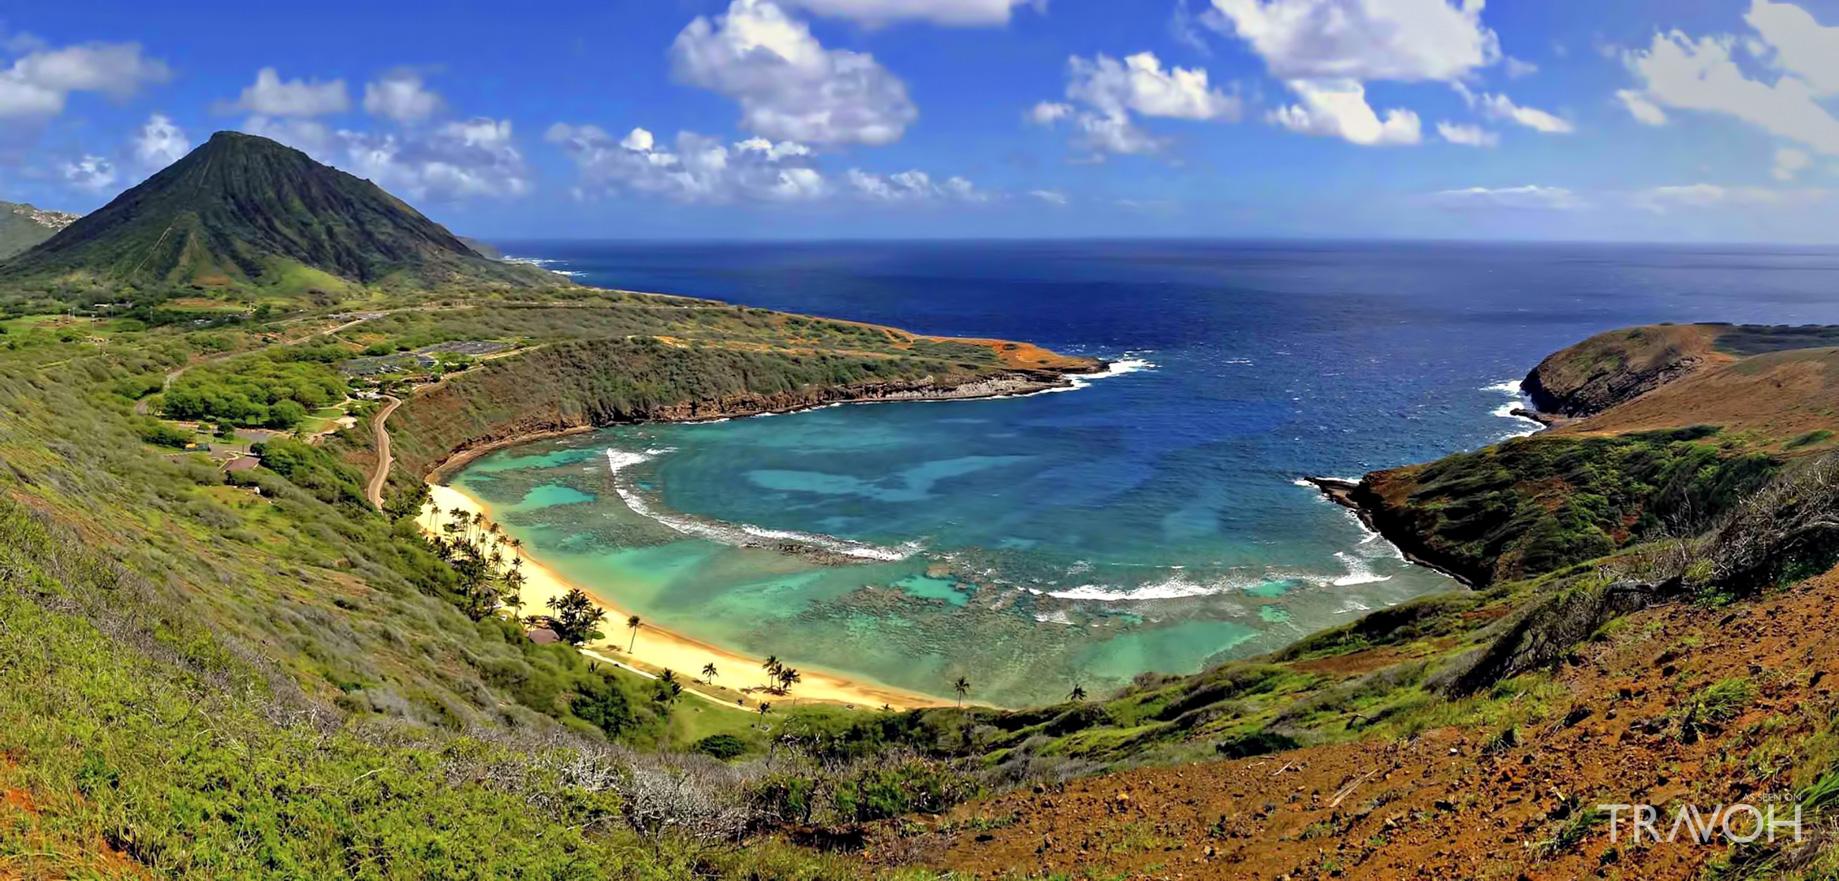 Hanauma Bay Beach - Oahu, Hawaii